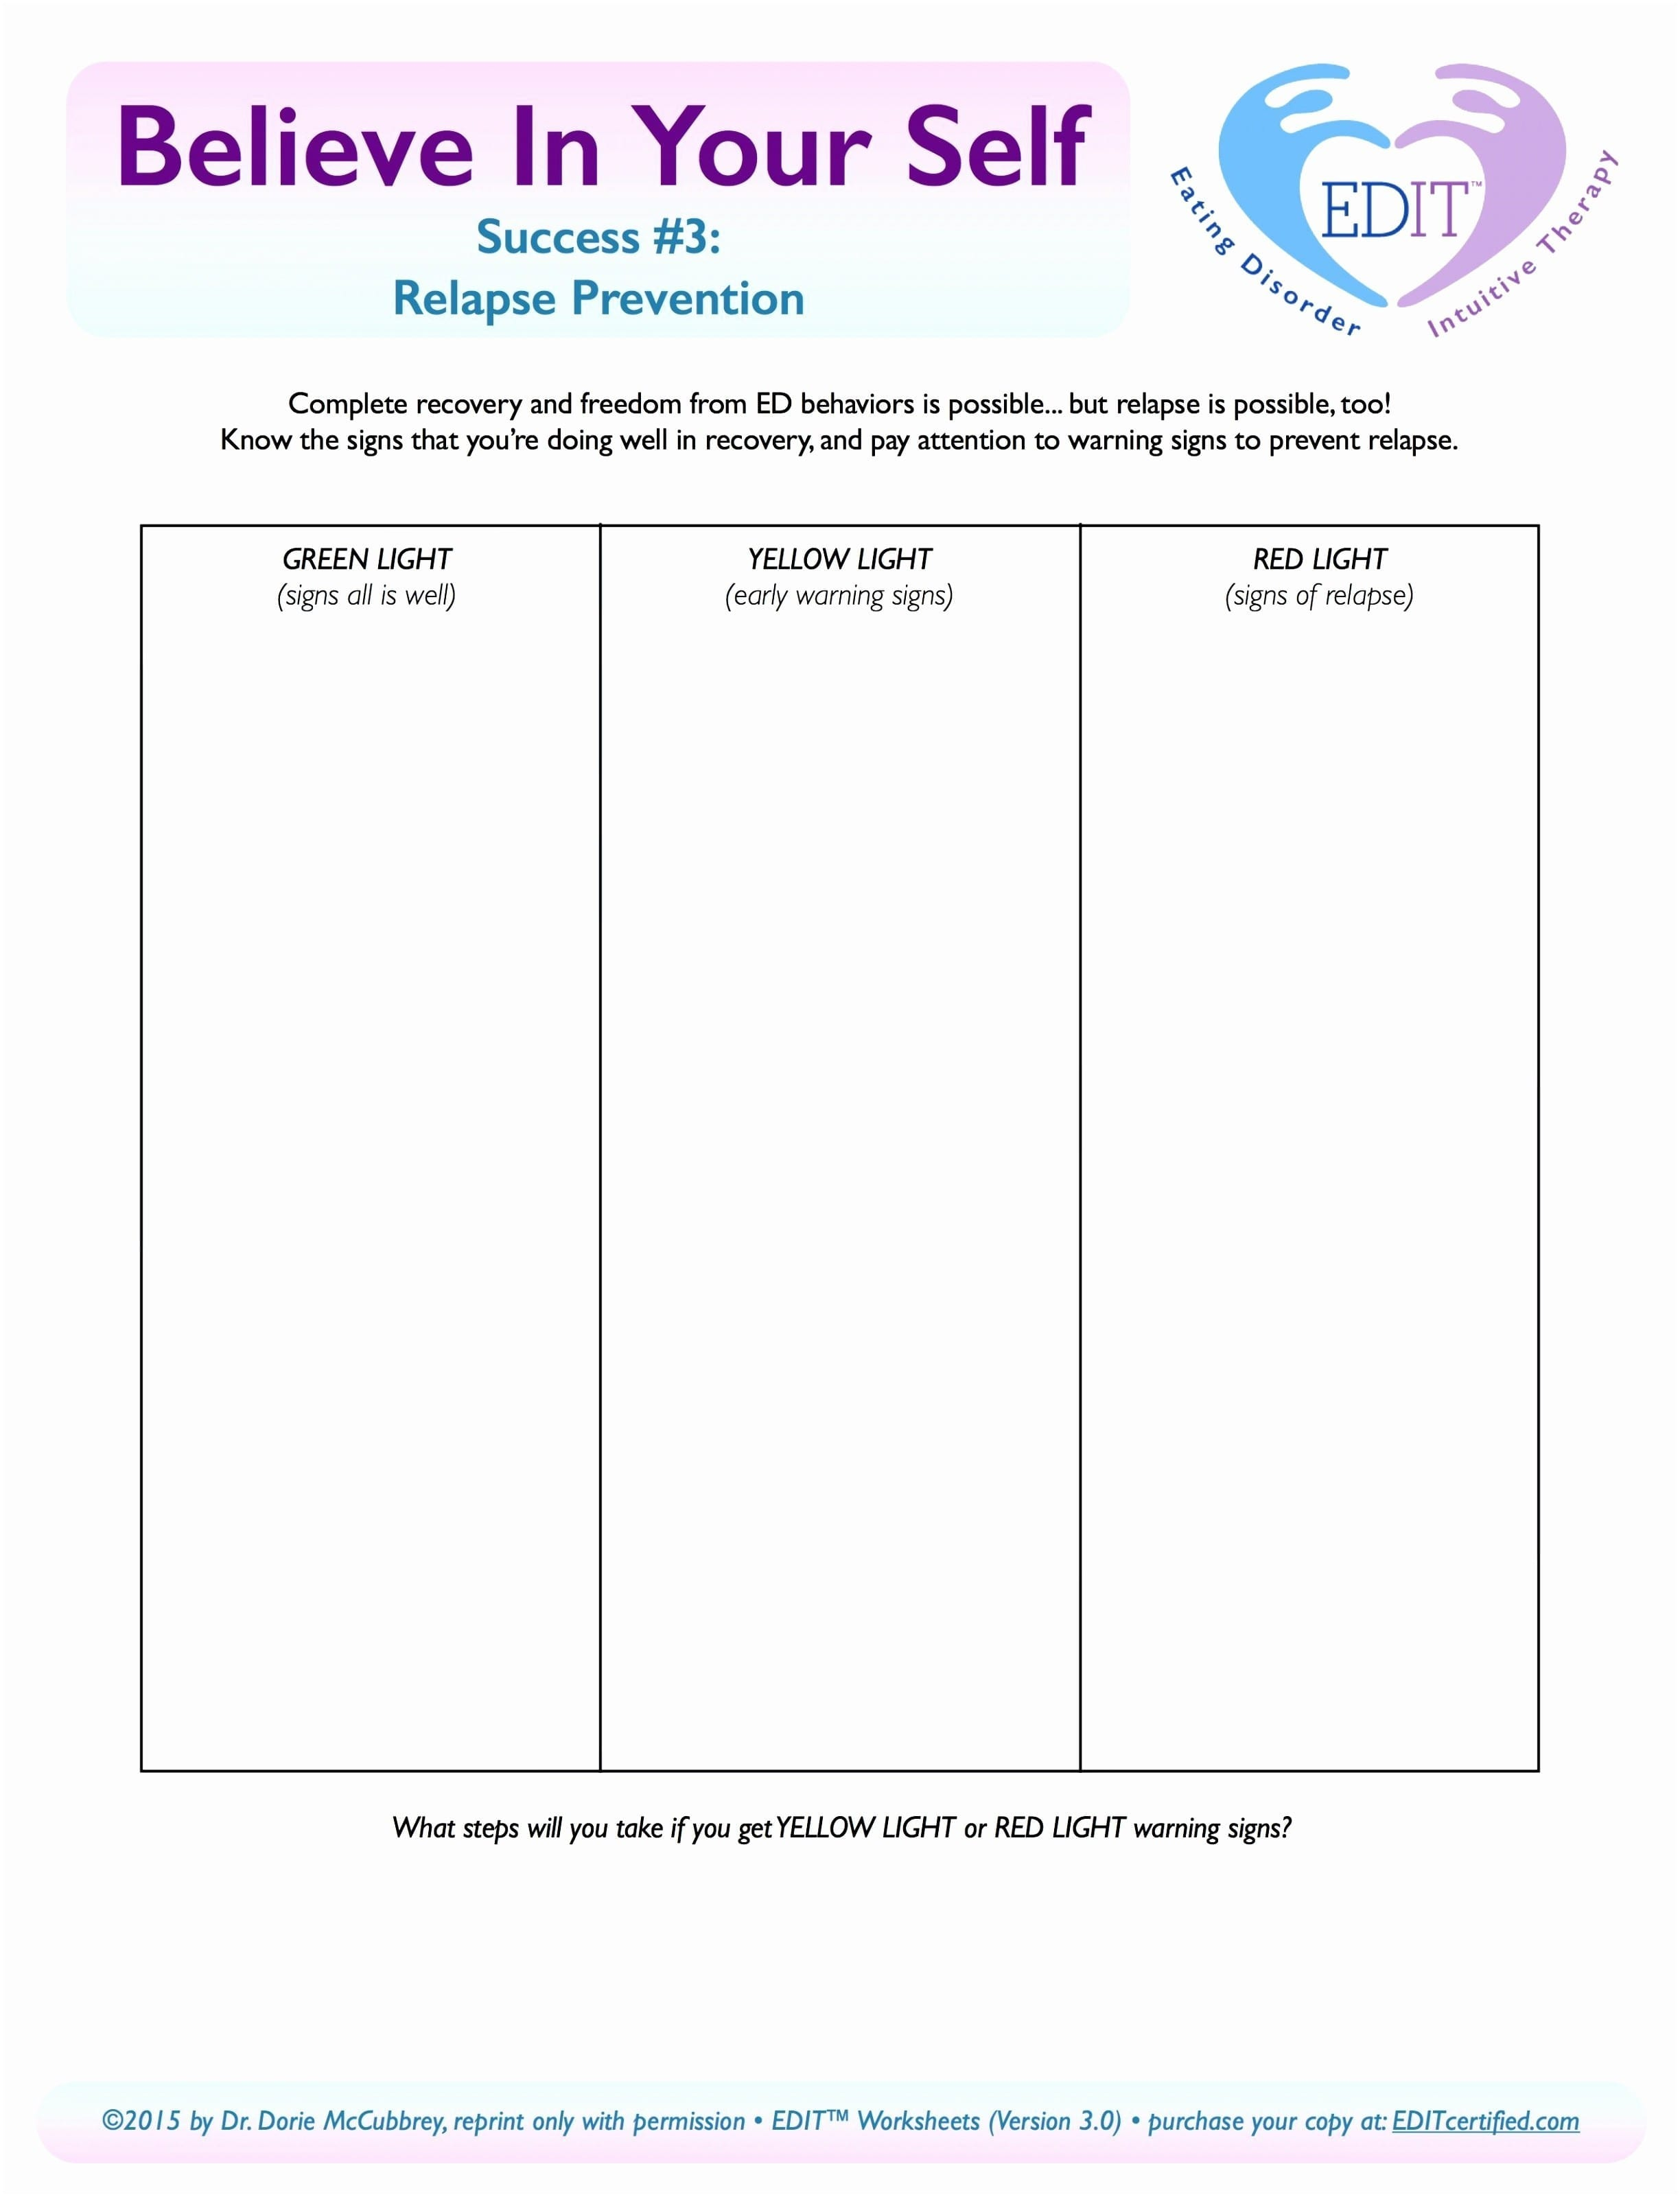 022 Substance Abuse Group Worksheets Elegant Relapse